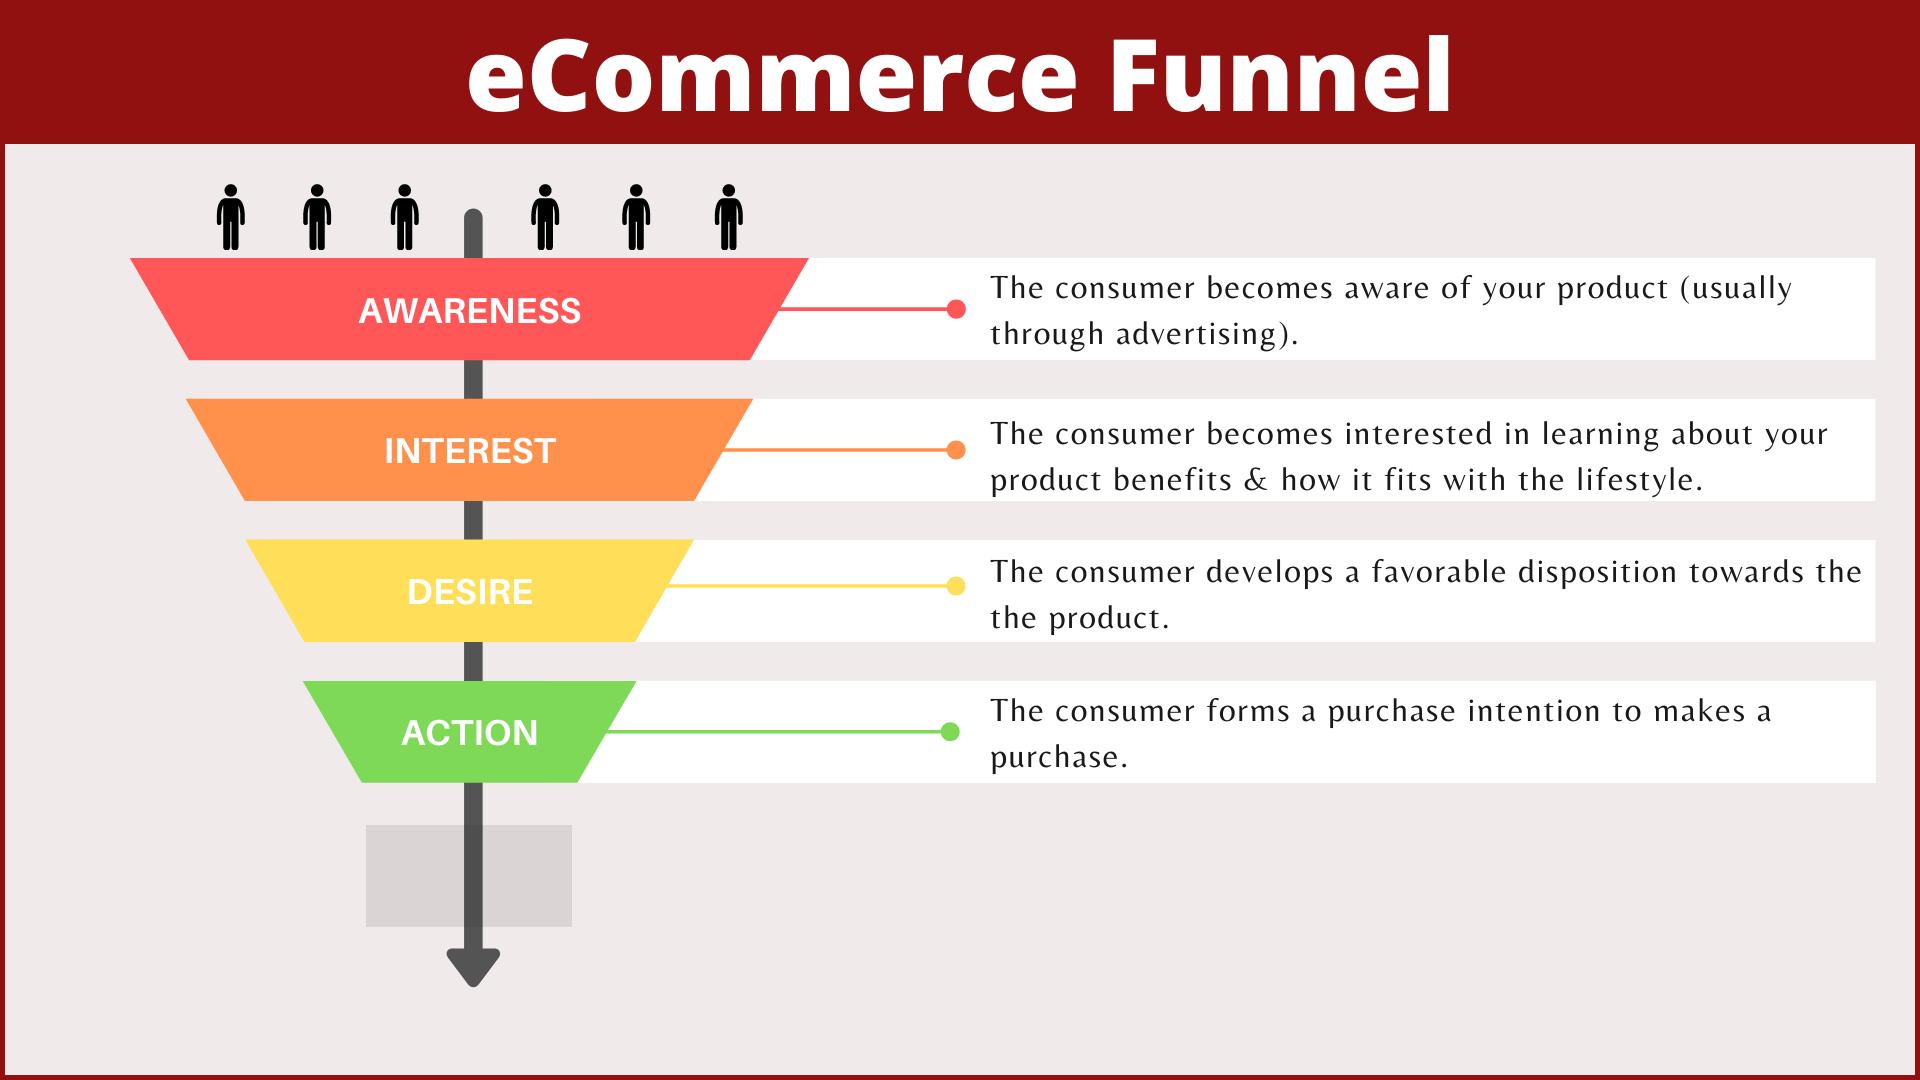 eCommerce Funnel Model